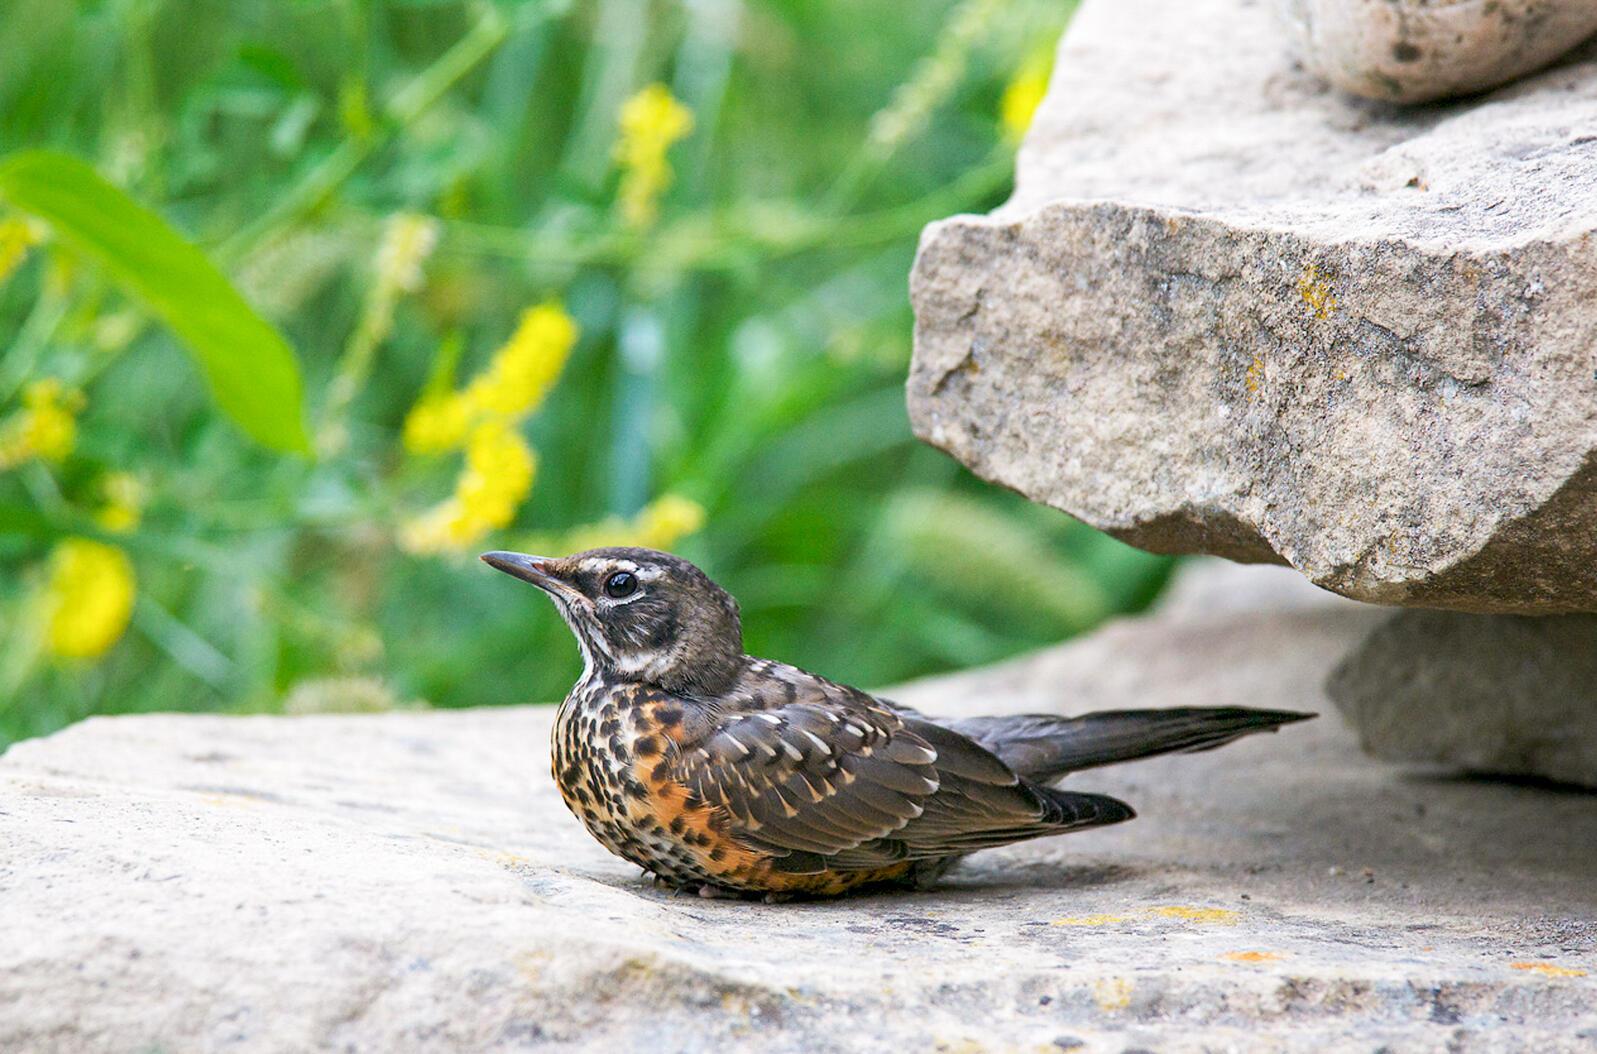 American Robin fledgling. Jeanette Tasey/Audubon Photography Awards